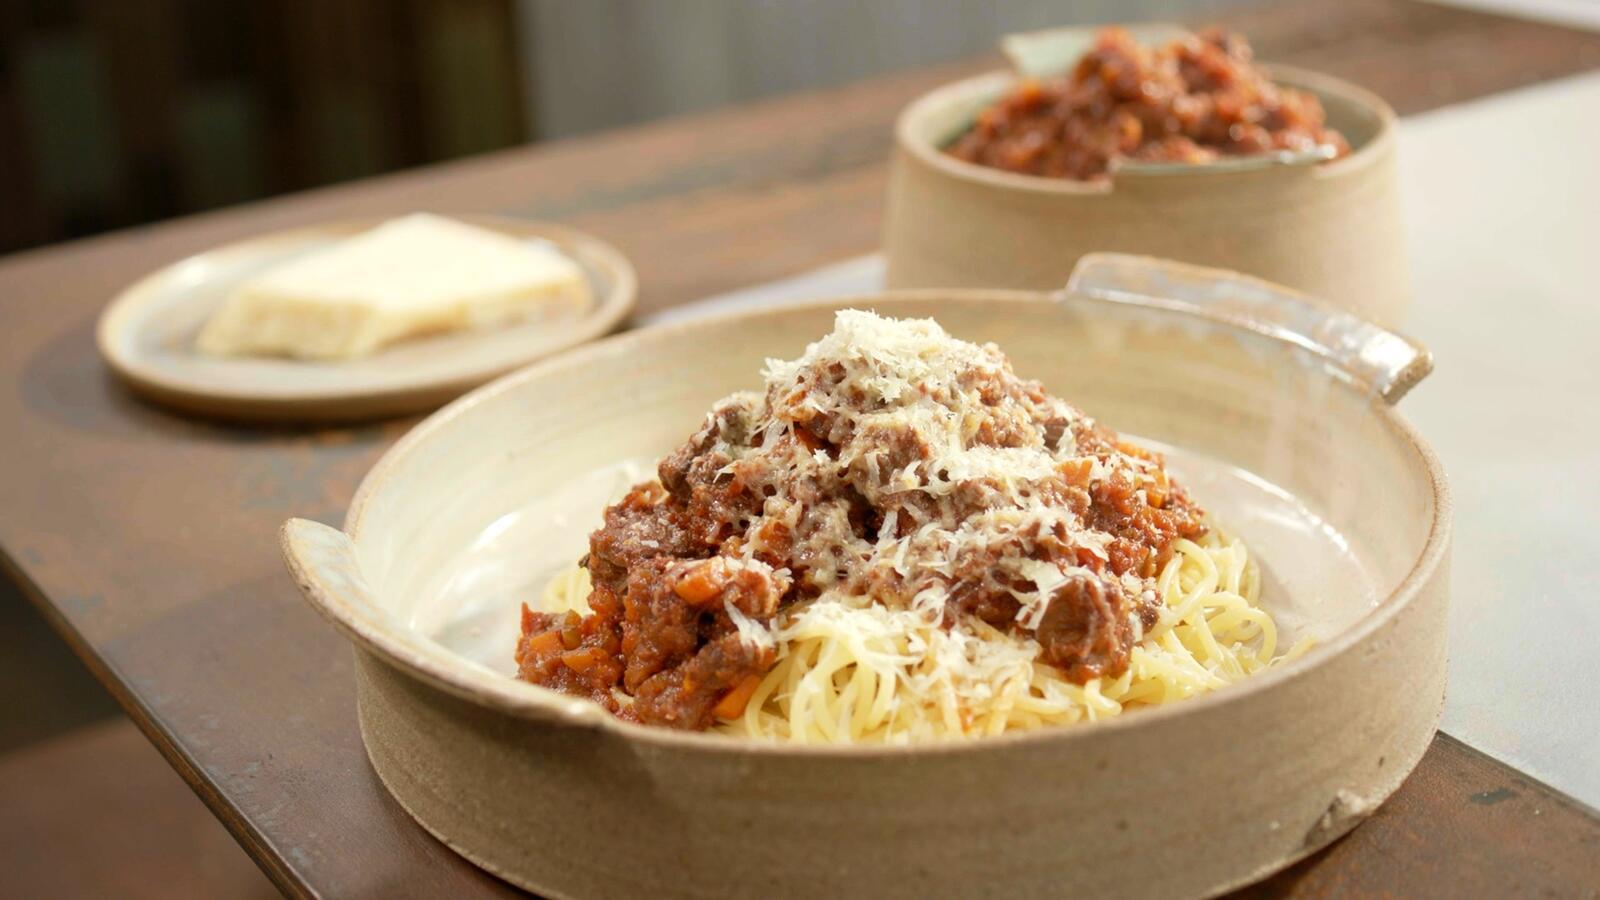 Ragu van schouderstuk met spaghetti